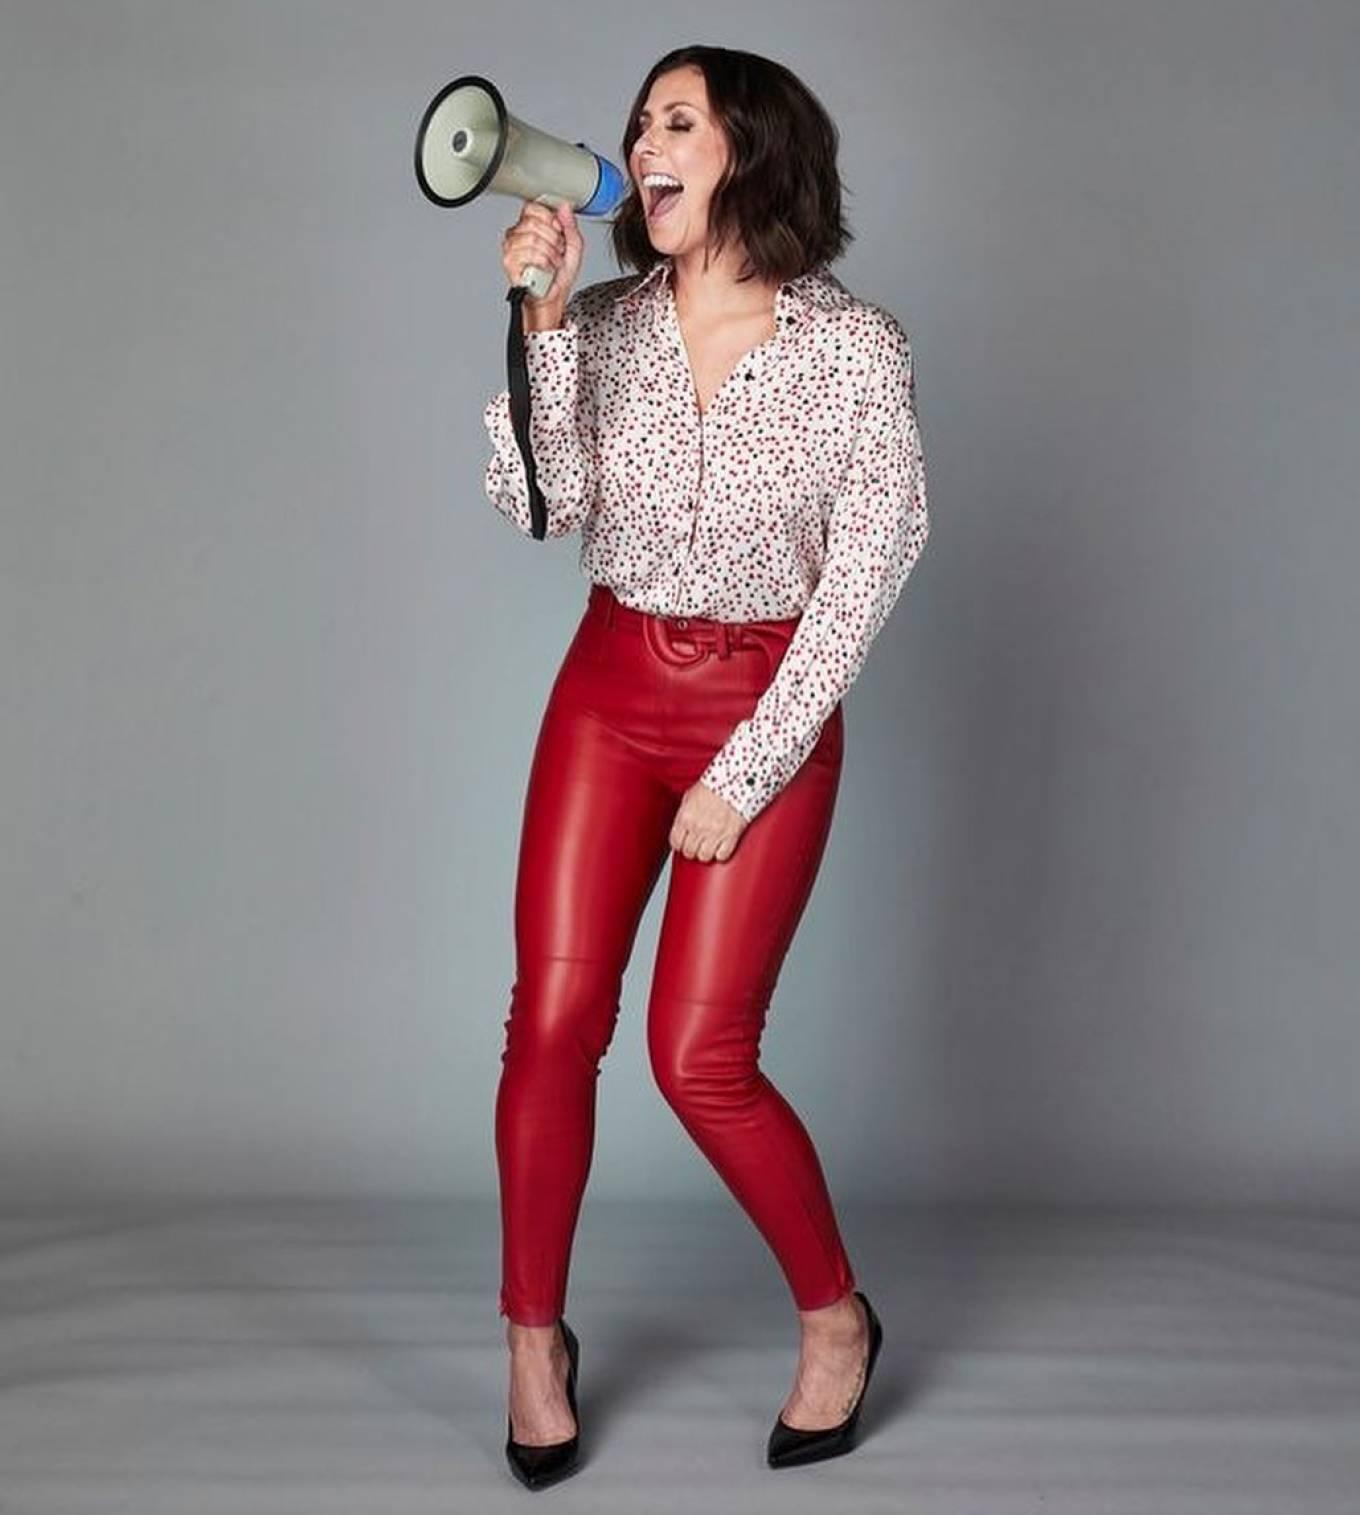 Kym Marsh - Lorna Roach Photoshoot (November 2020)